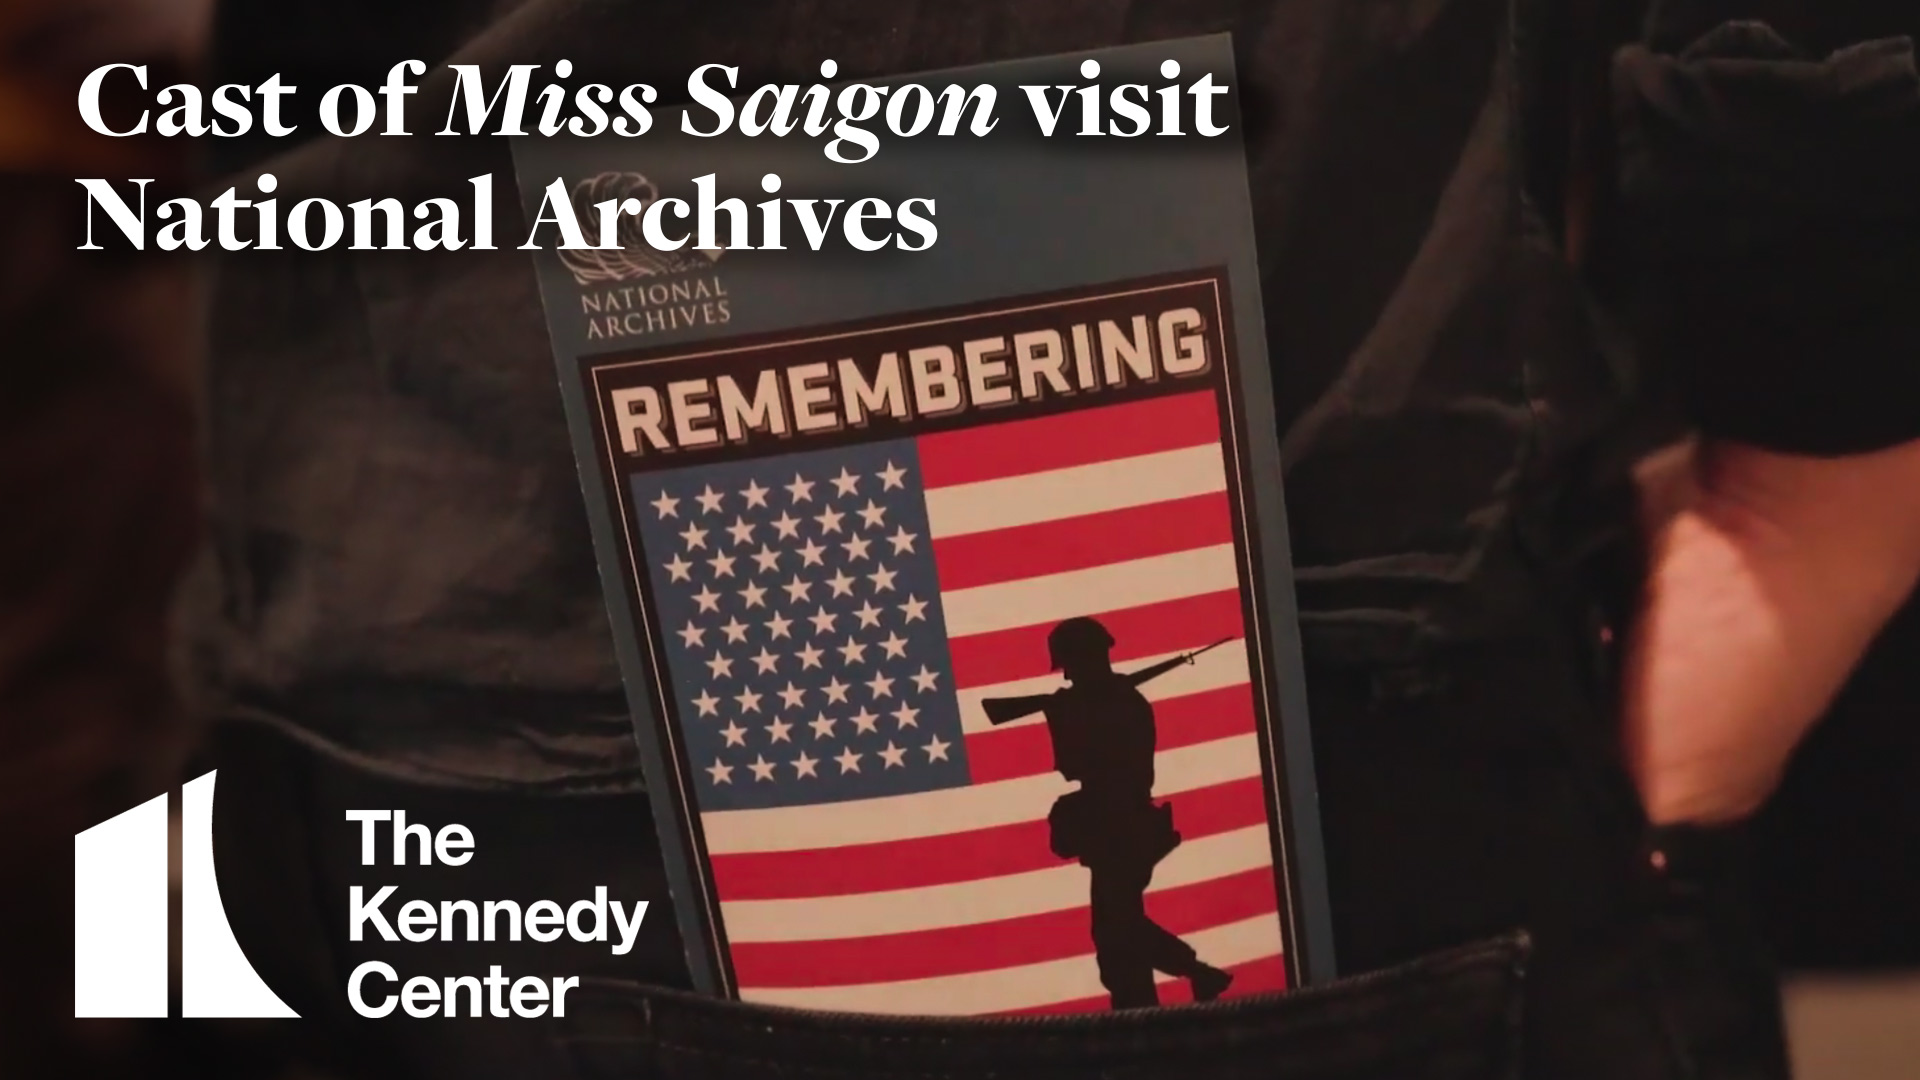 Cast of Miss Saigon Visit National Archives